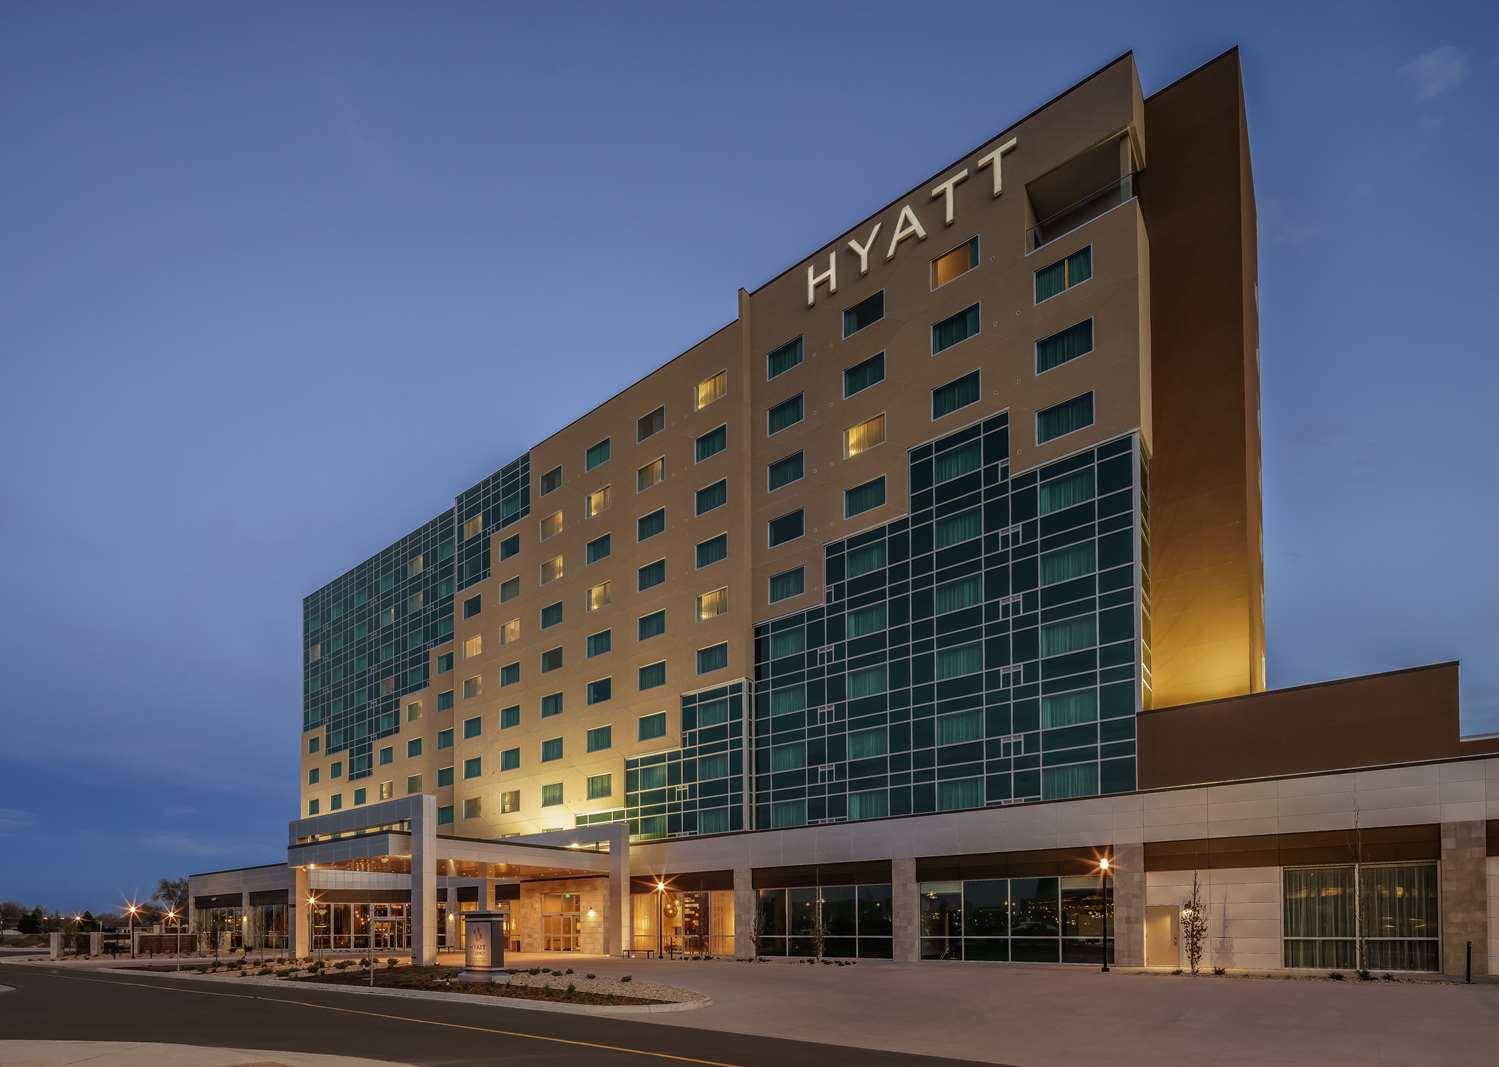 Exterior view - Hyatt Regency Hotel Conference Center Aurora